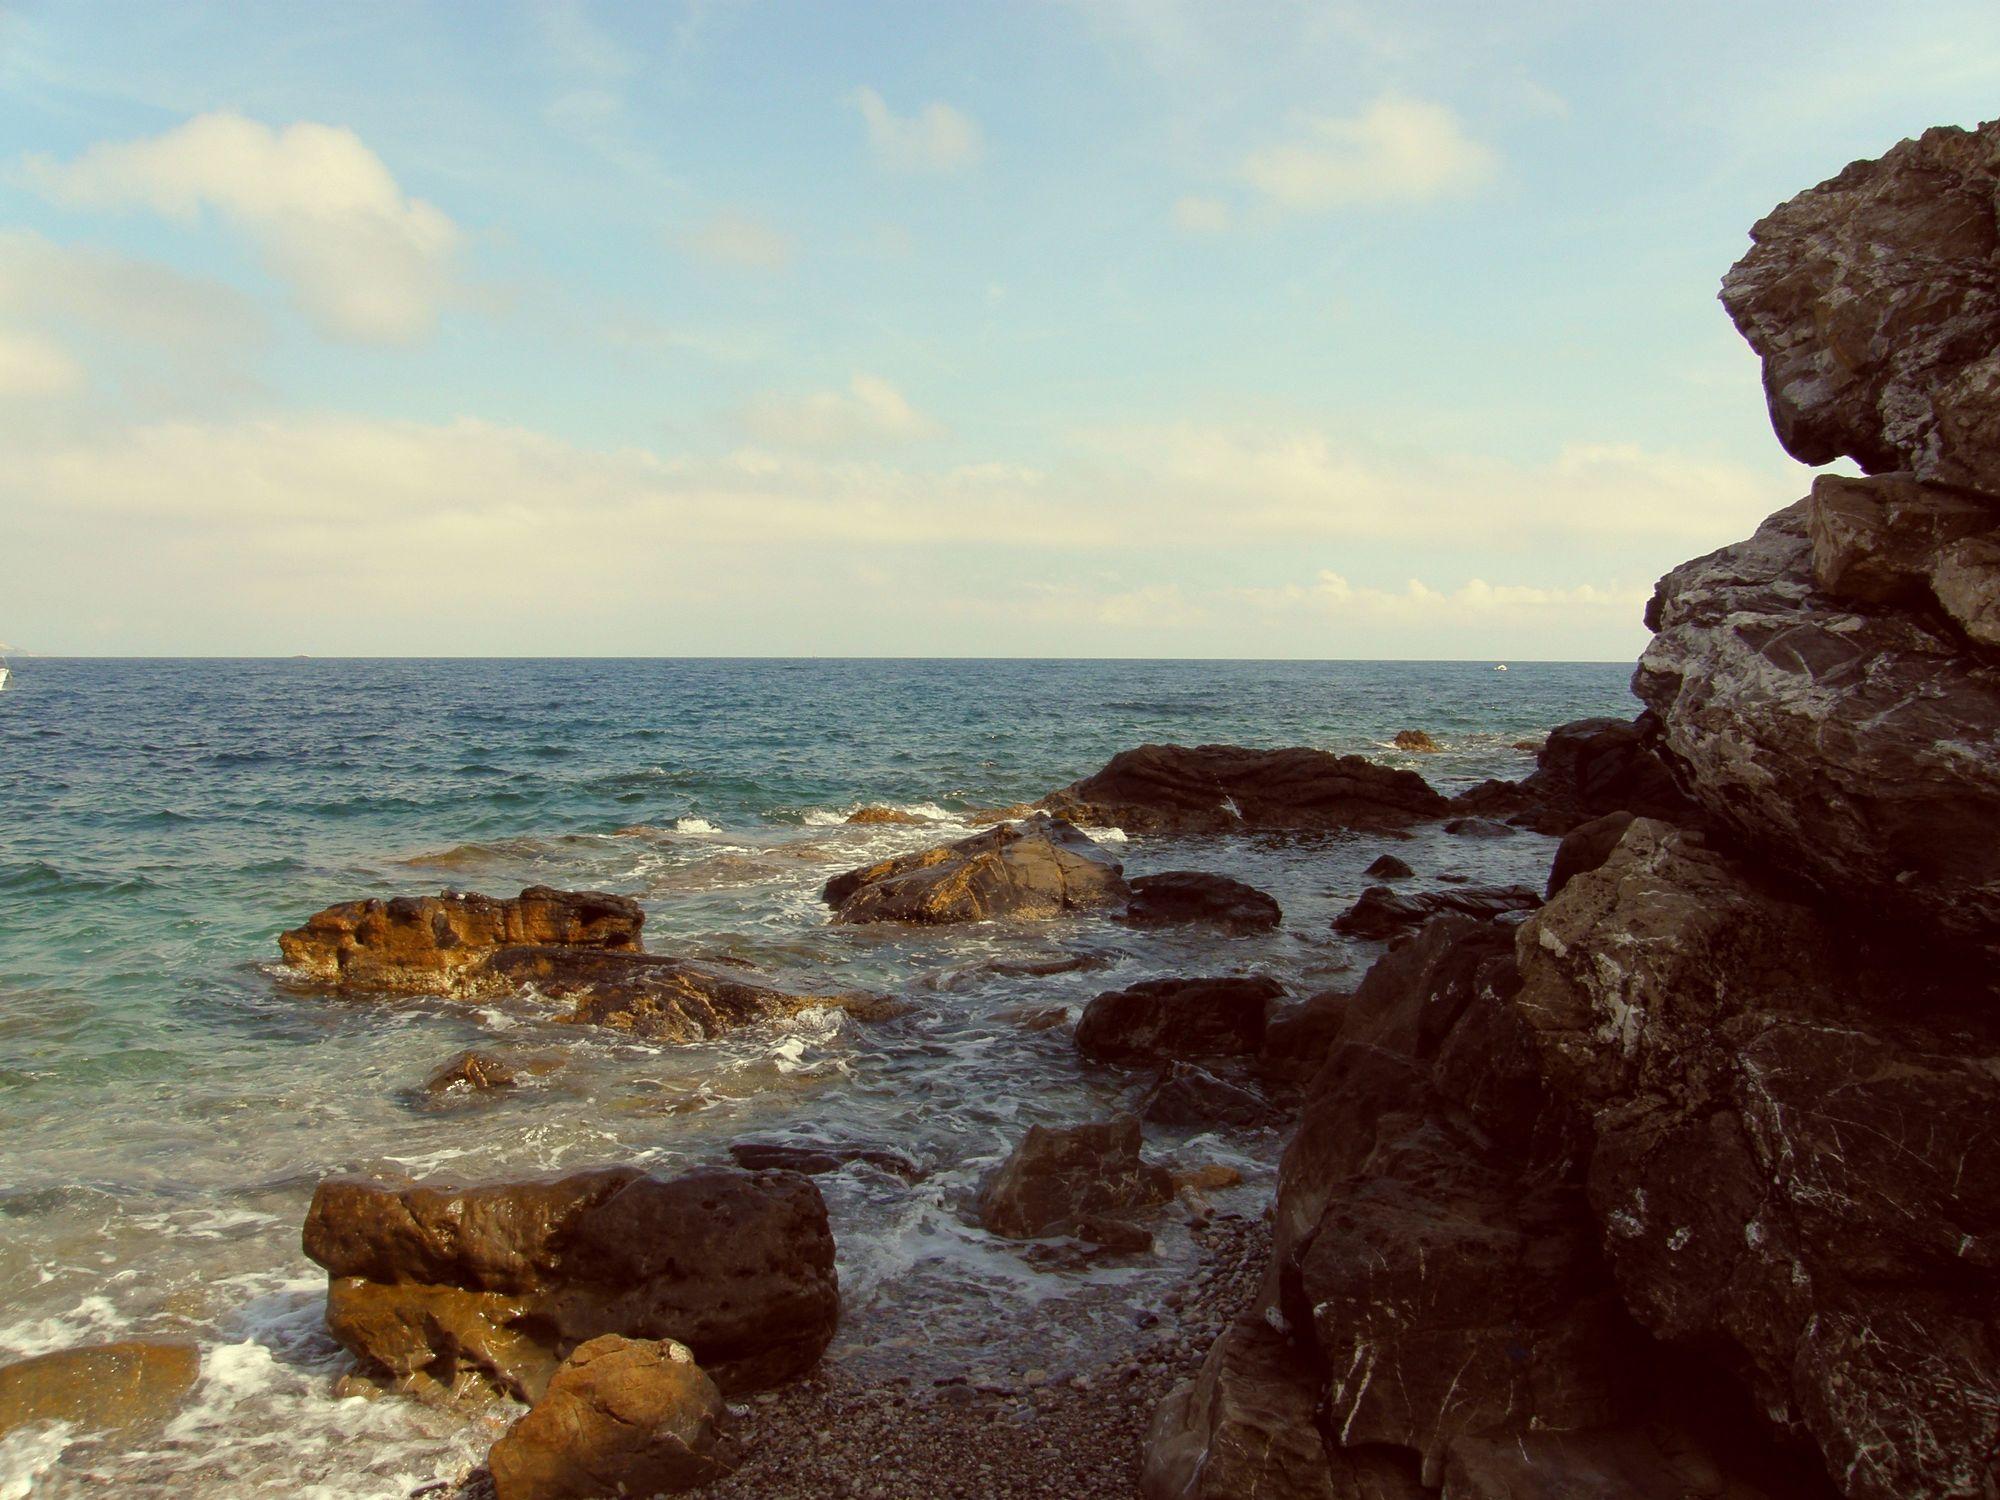 Bild mit Strände, Strand, Meer, Sehnsucht nach Meer, Fels, felsstrand